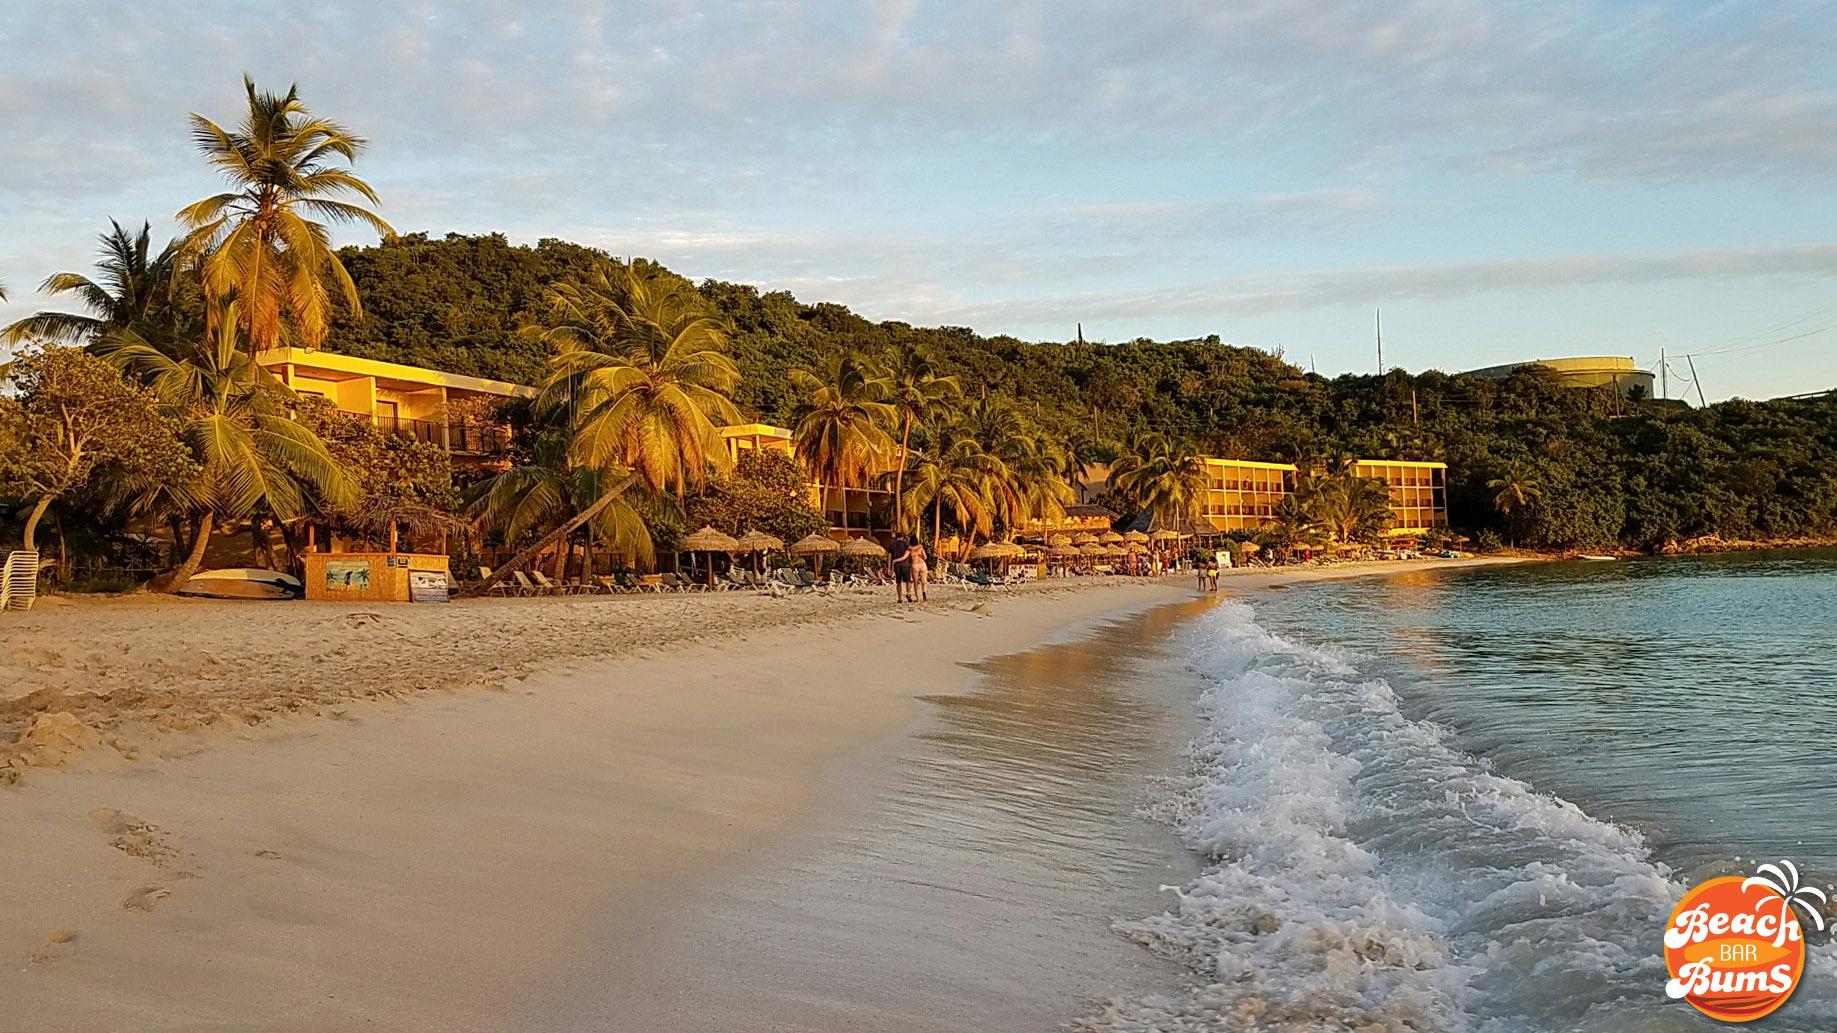 Emerald Beach Resort St Thomas Lindbergh Bay Usvi Us Virgin Islands